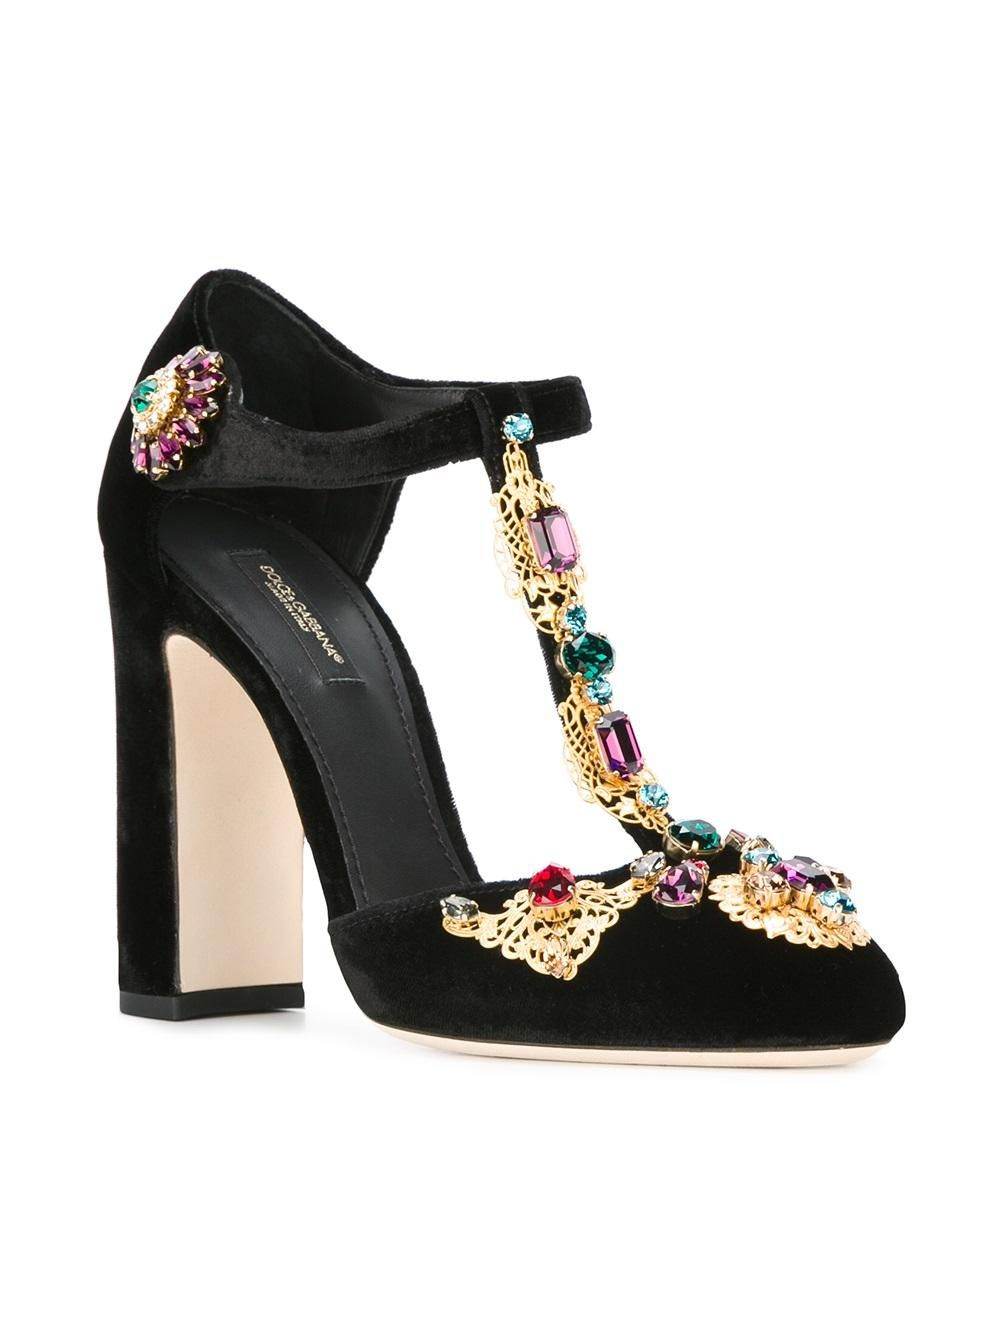 Dolce & Gabbana Vally Mary Jane Pumps - Farfetch